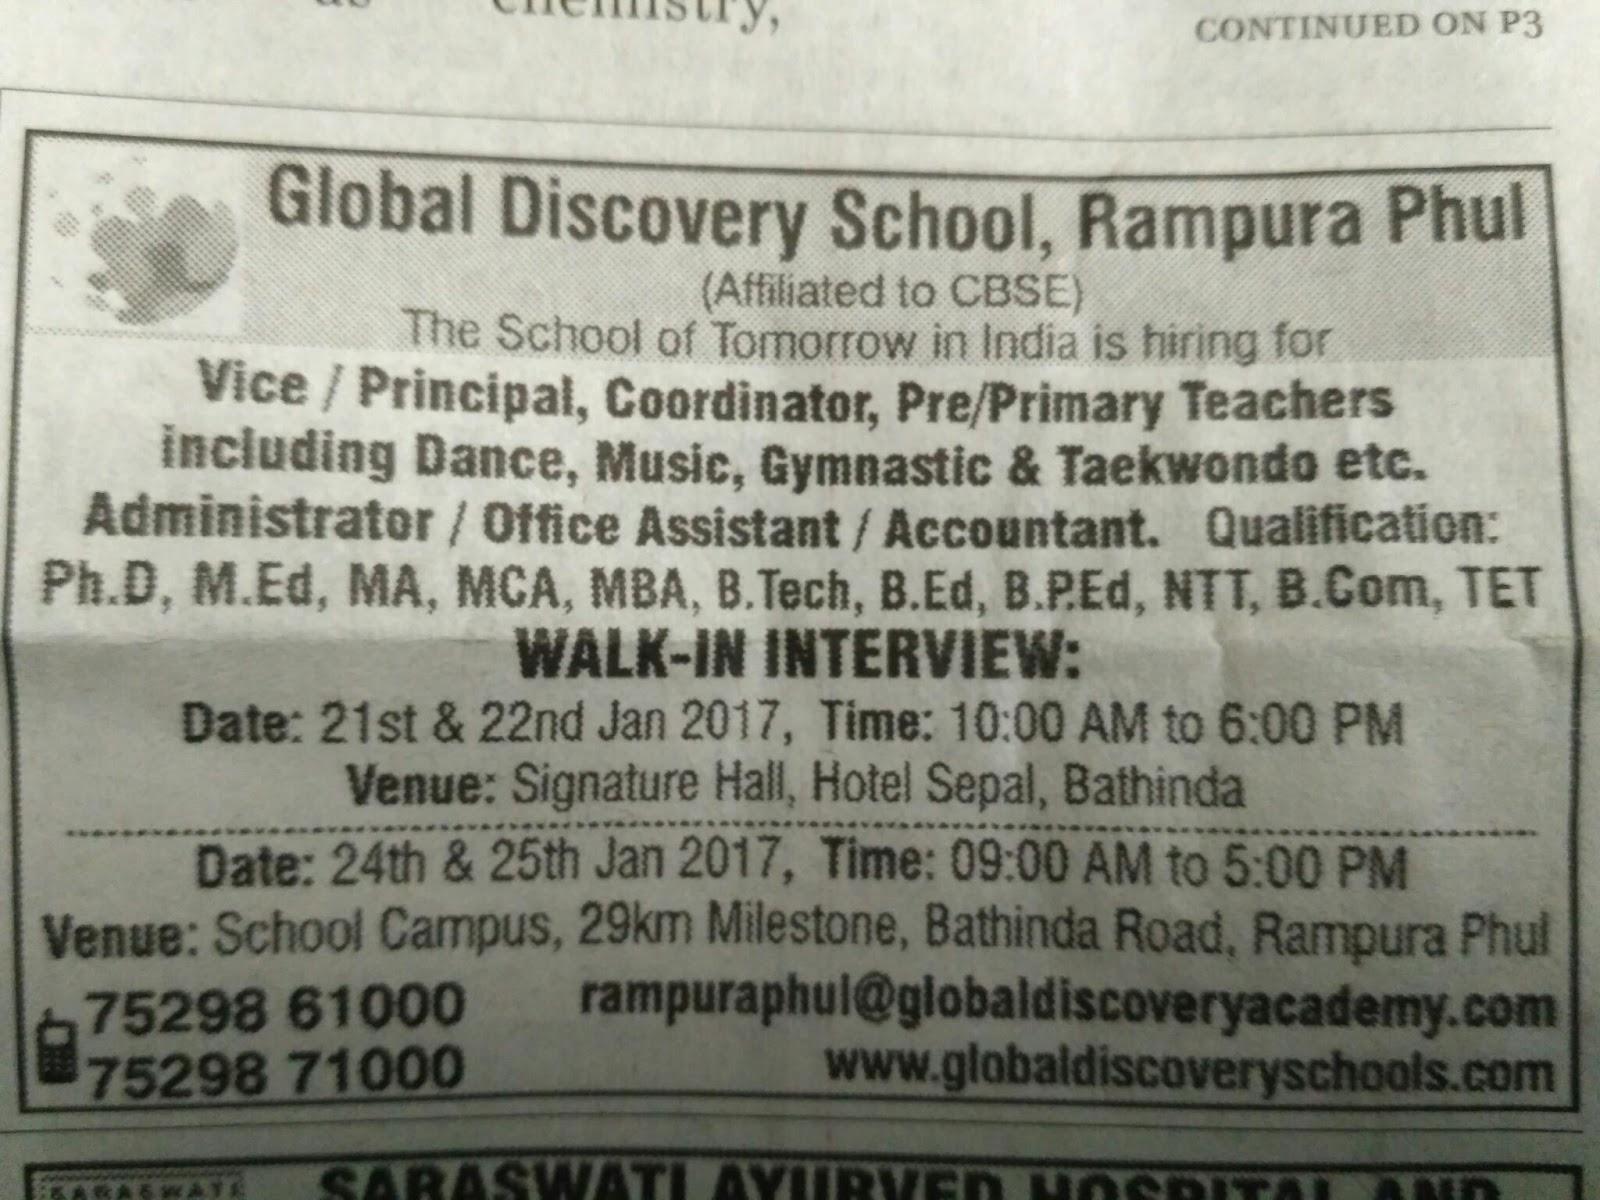 global discovery school rampura phul walk in interview 21 jan and